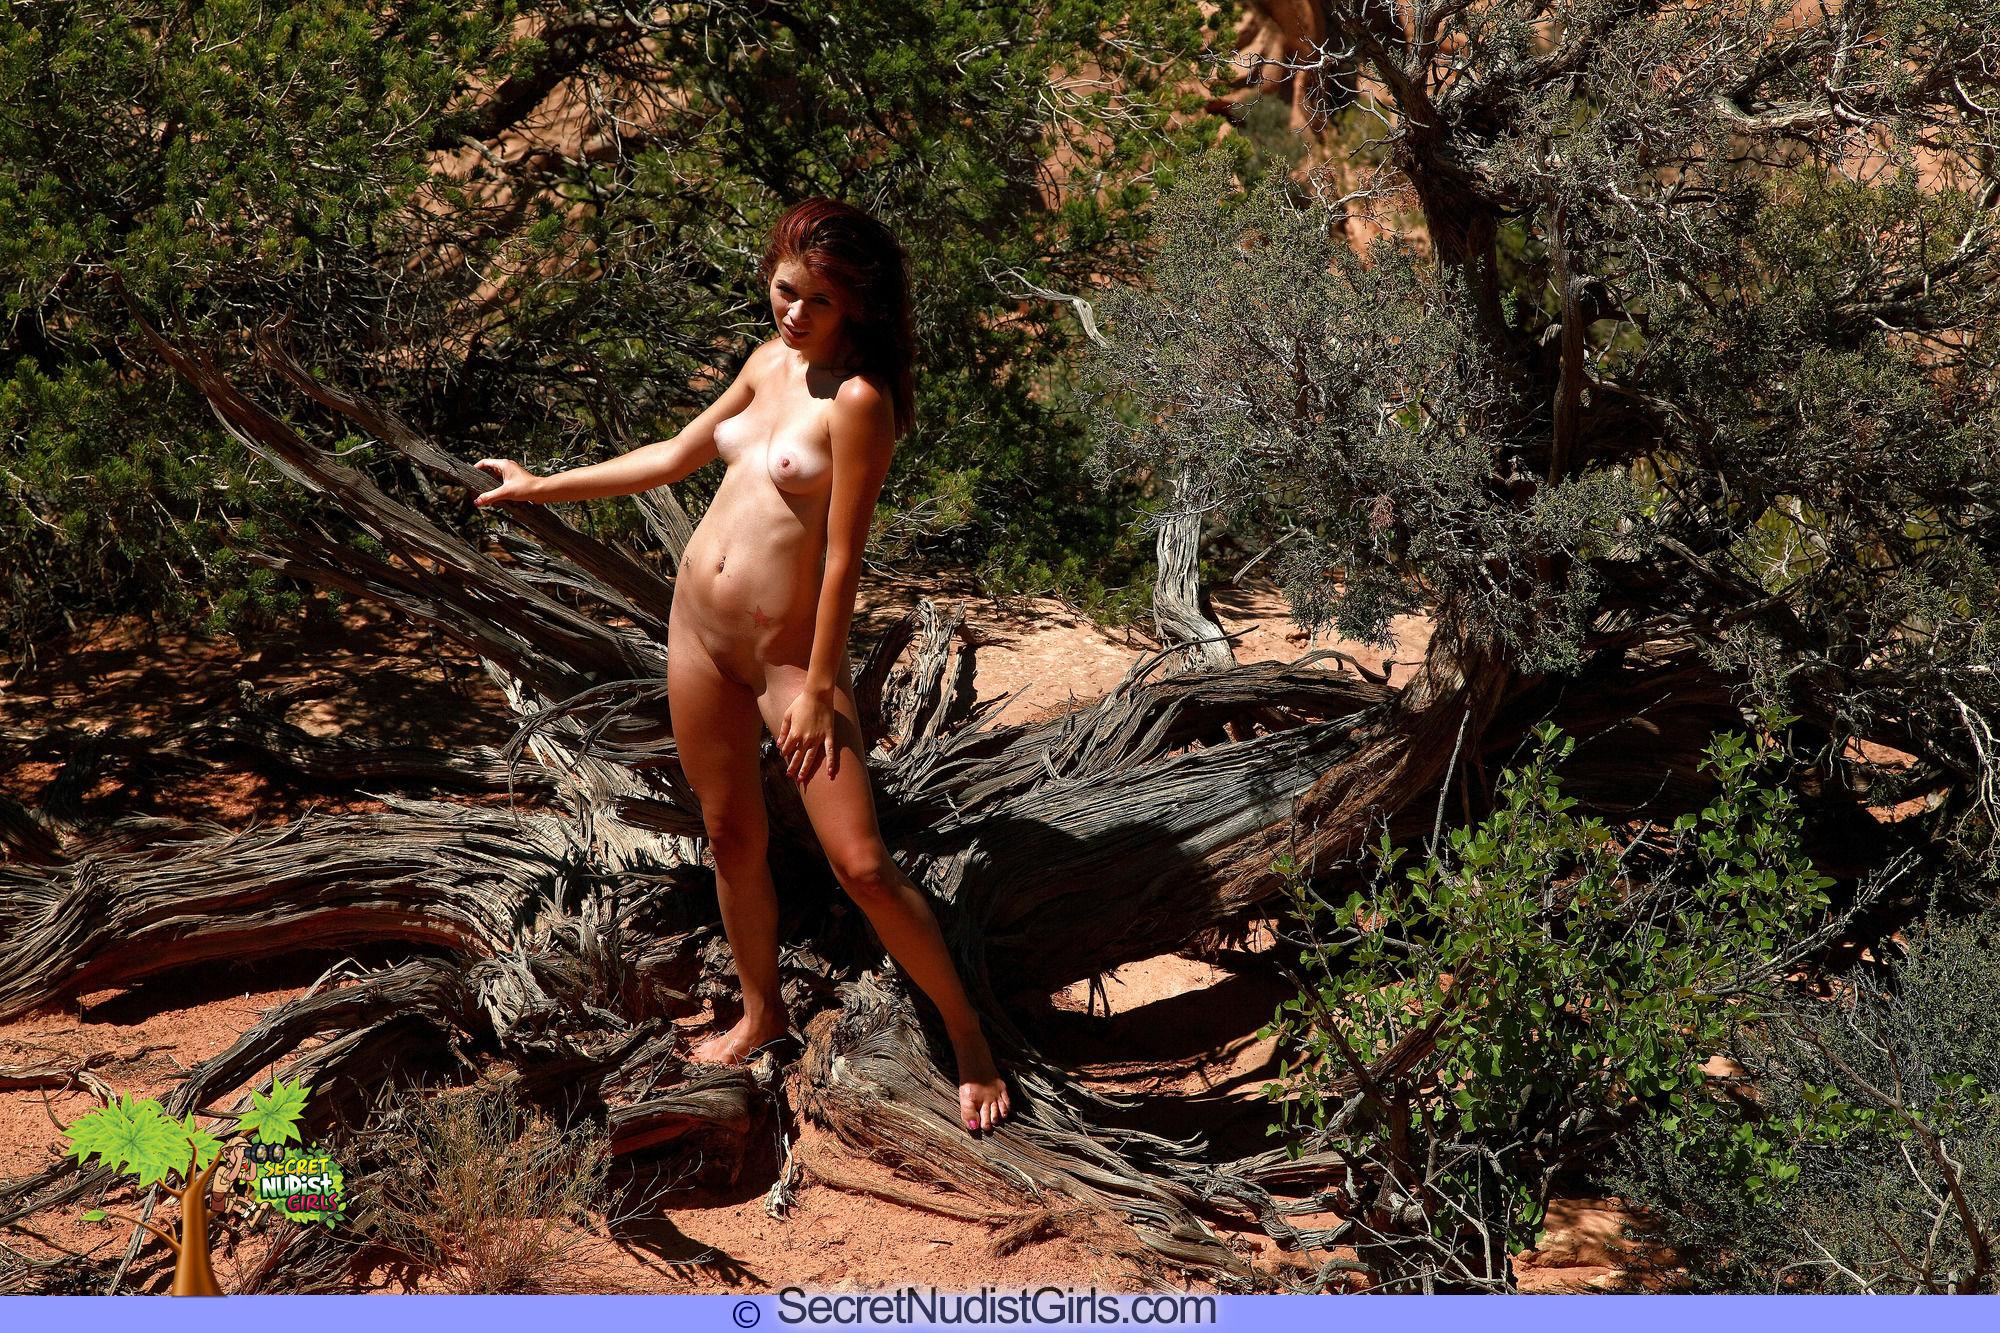 Heidi strange nude girlfriend — photo 14